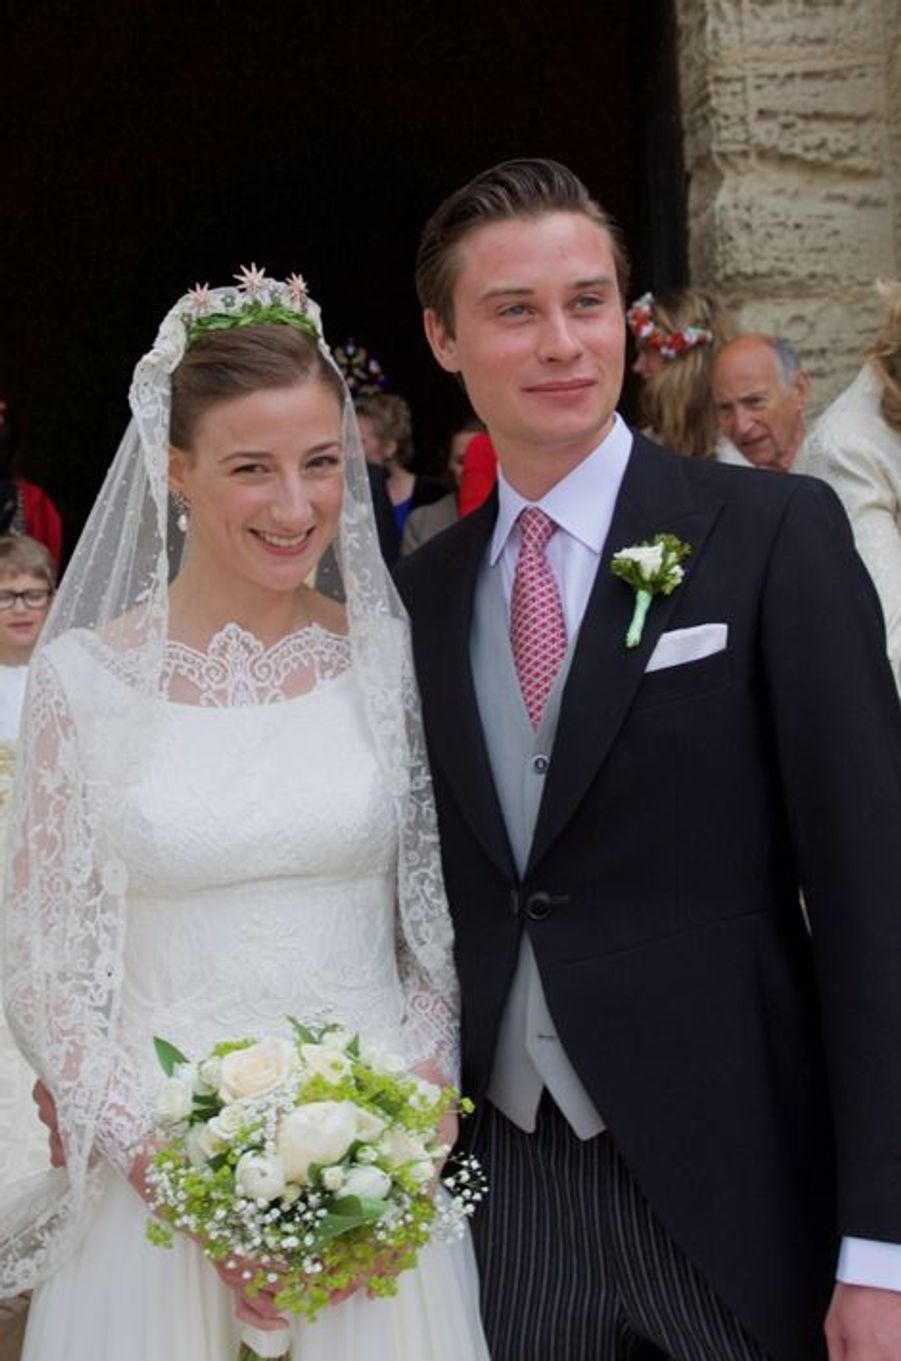 Caroline von Neipperg et Philippe de Limburg Stirum à Saint-Emilion, le 23 mai 2015